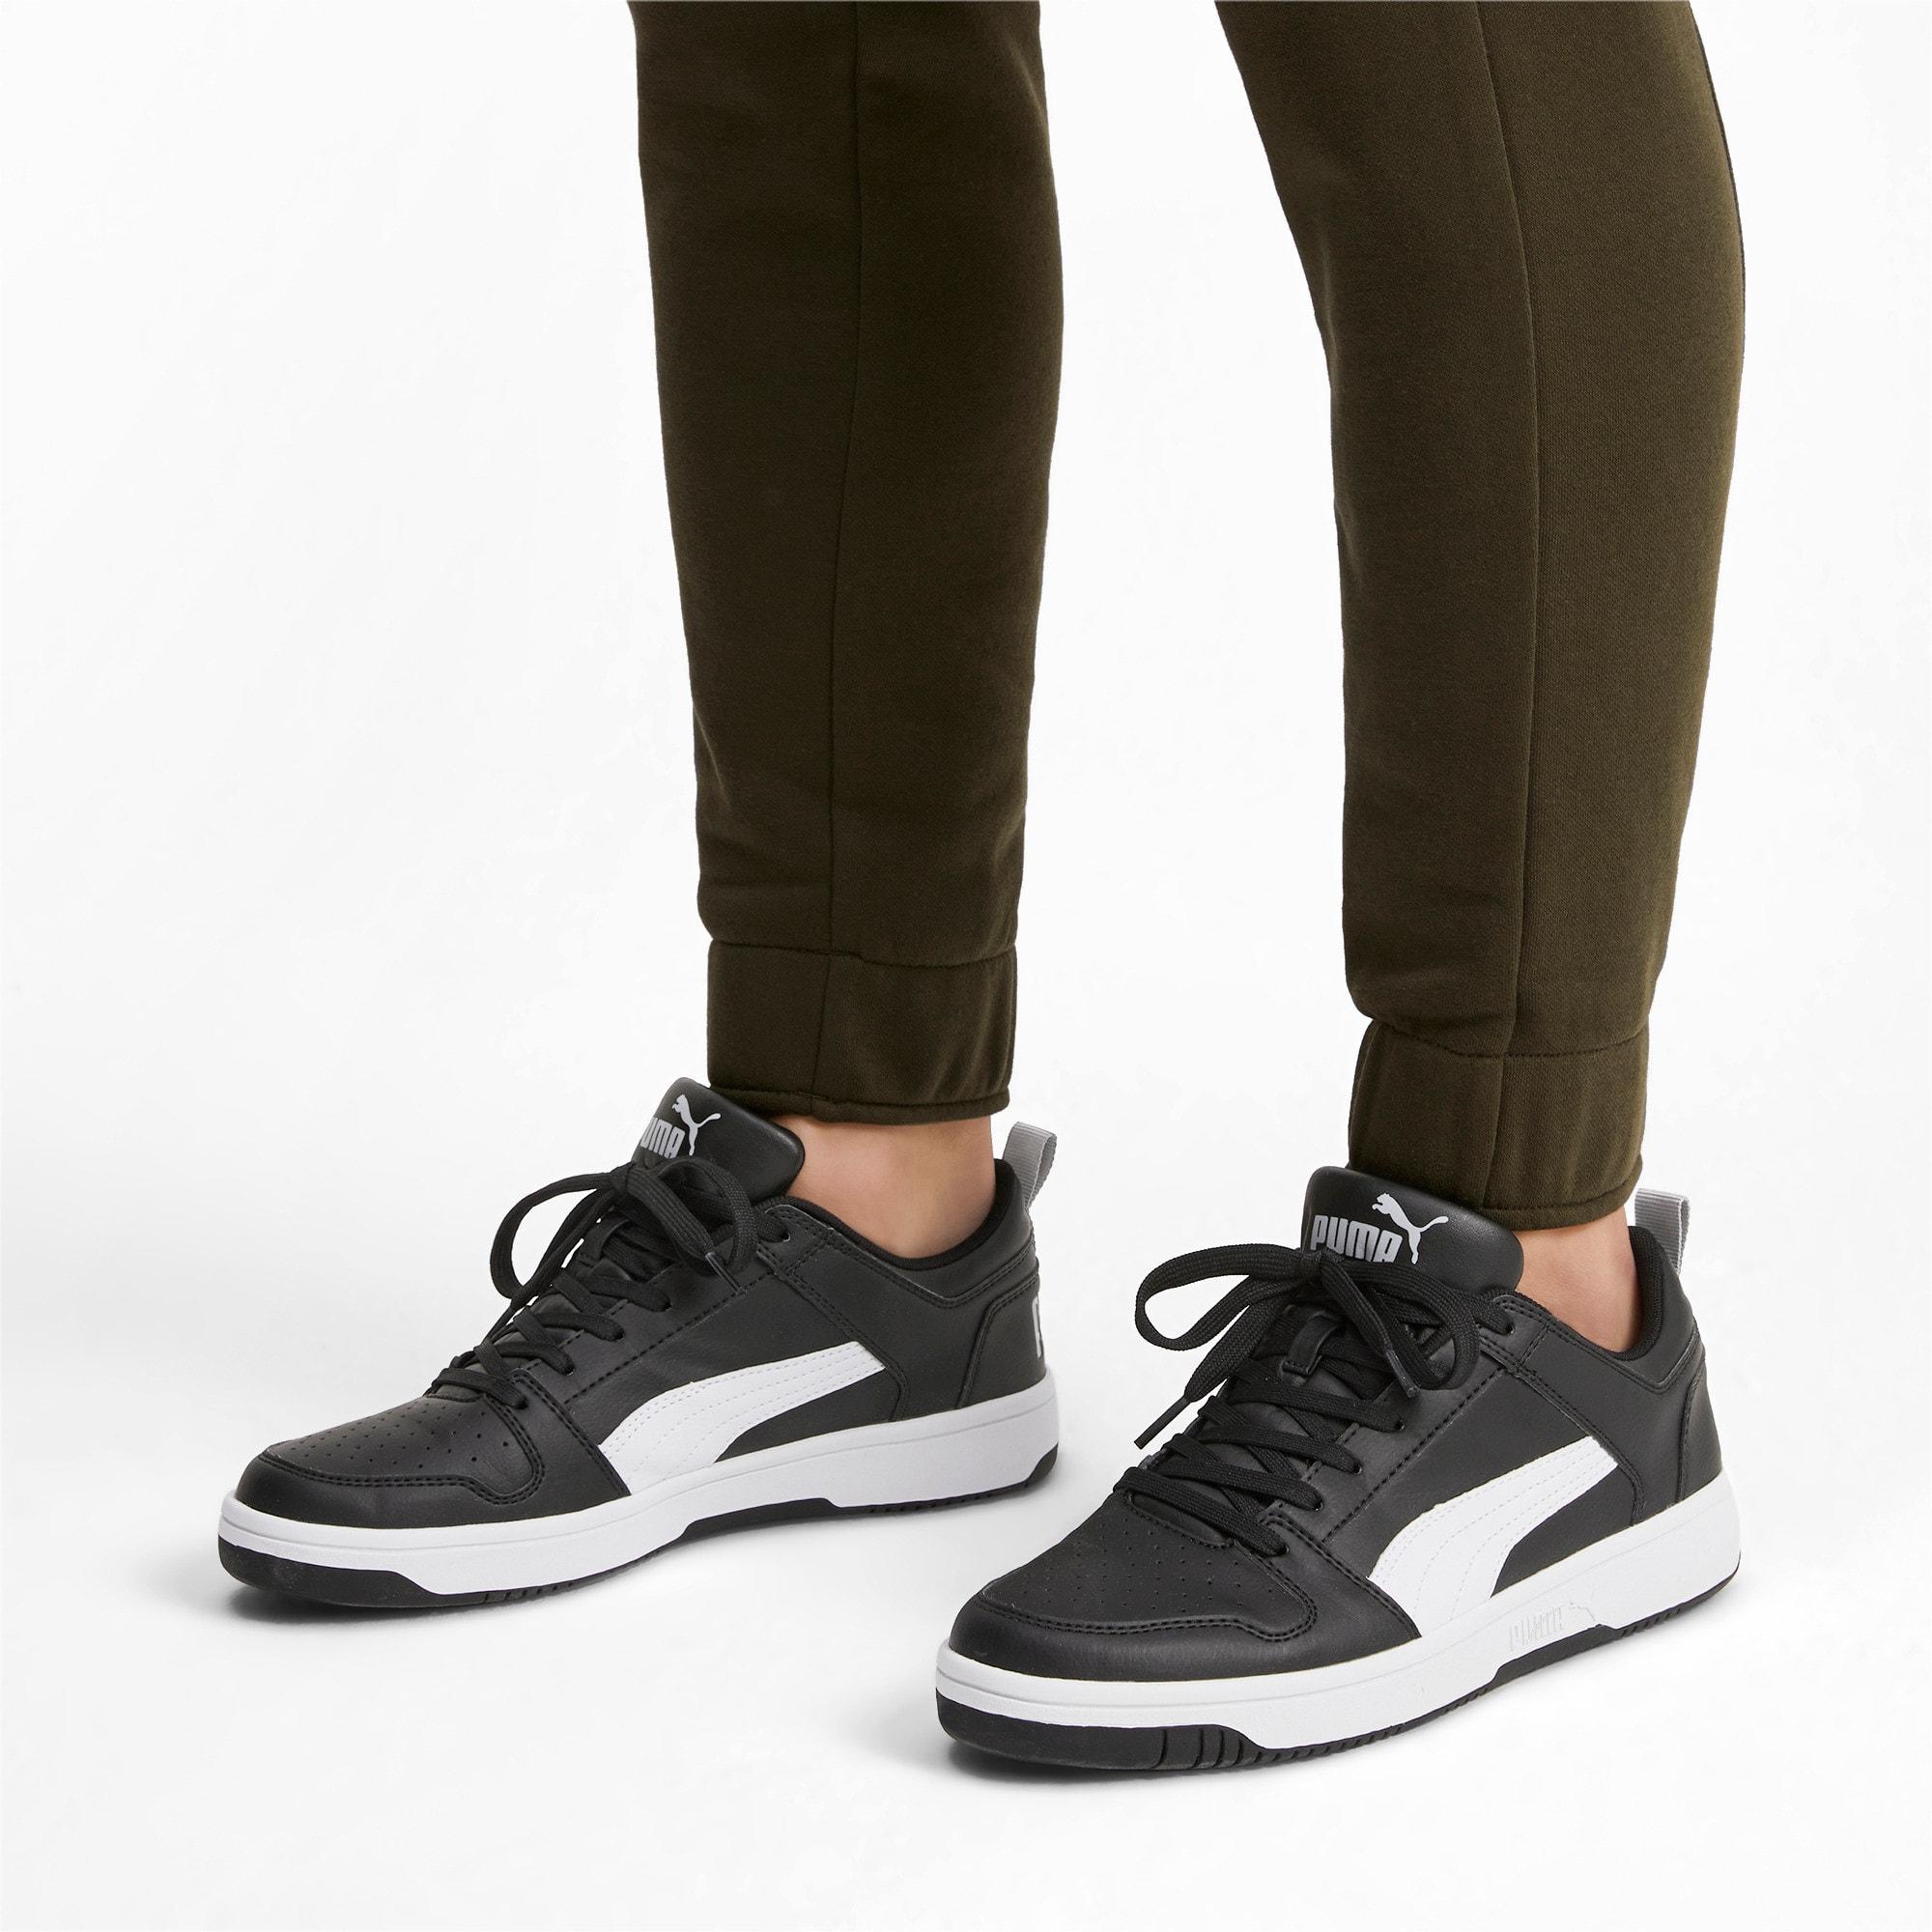 Thumbnail 2 of PUMA Rebound LayUp Lo Sneakers, Puma Black-White-High Rise, medium